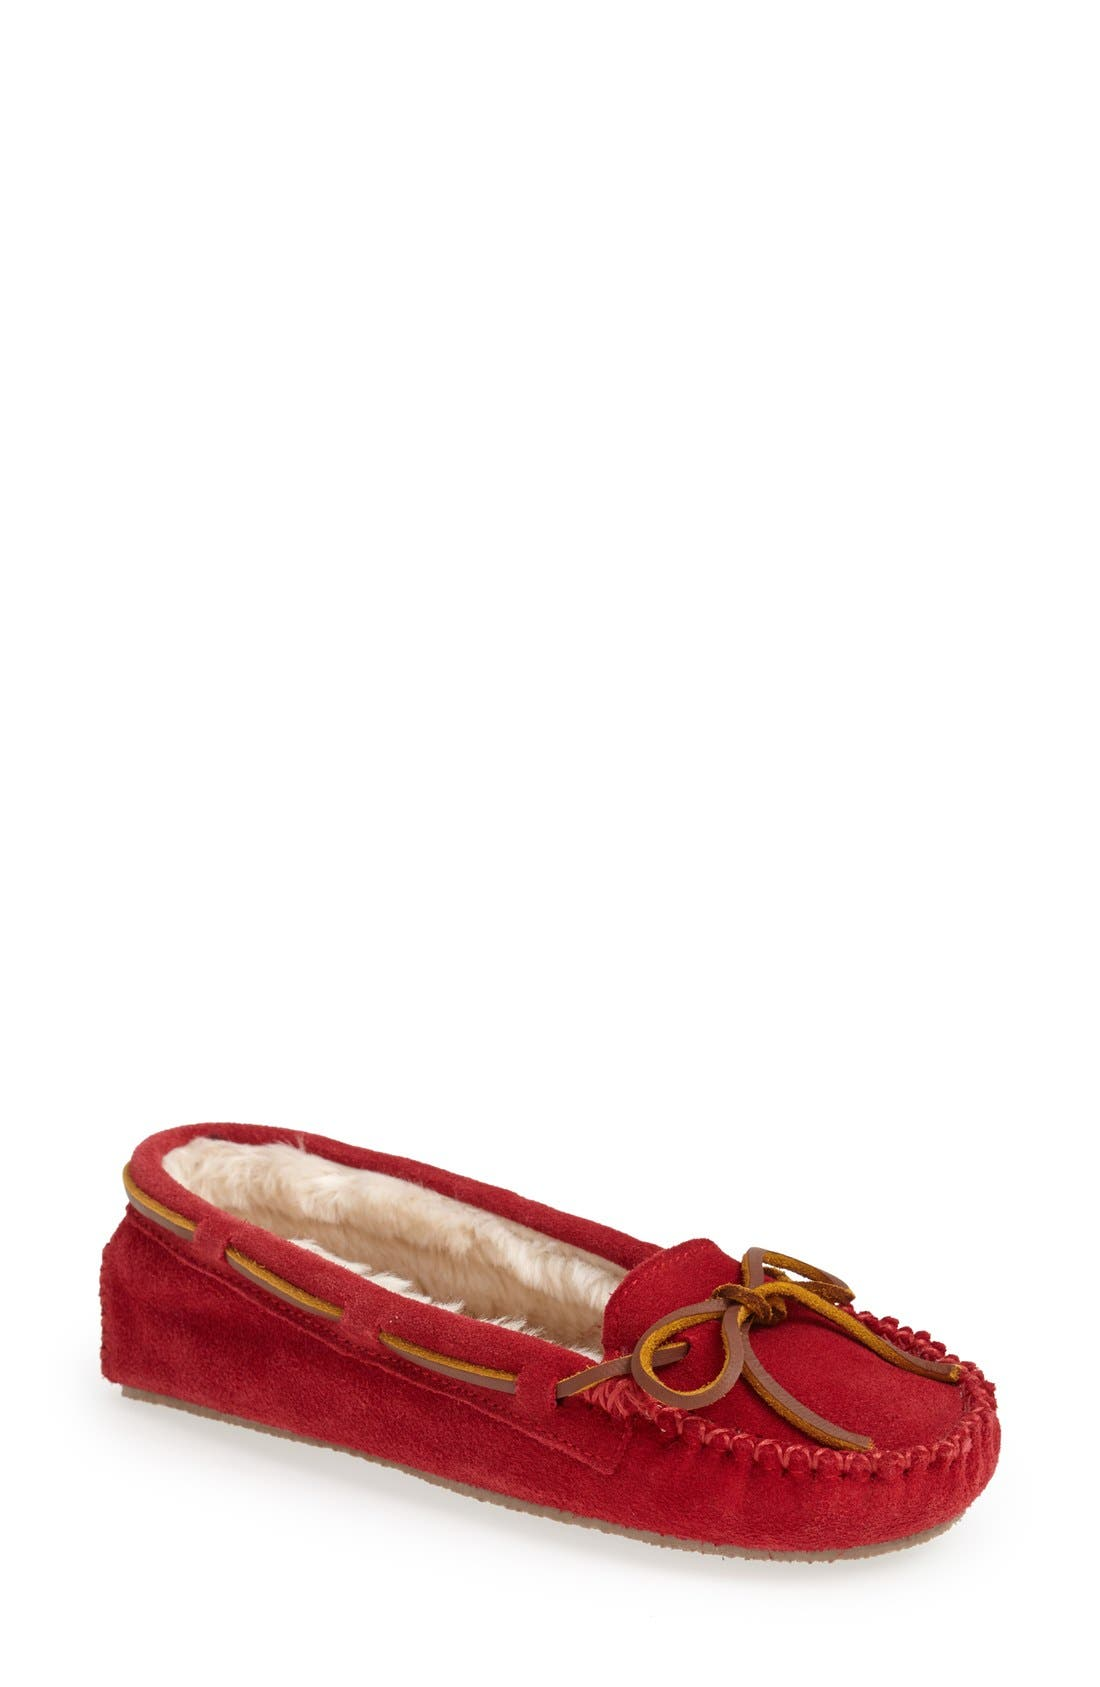 MINNETONKA,                             'Cally' Slipper,                             Main thumbnail 1, color,                             RED